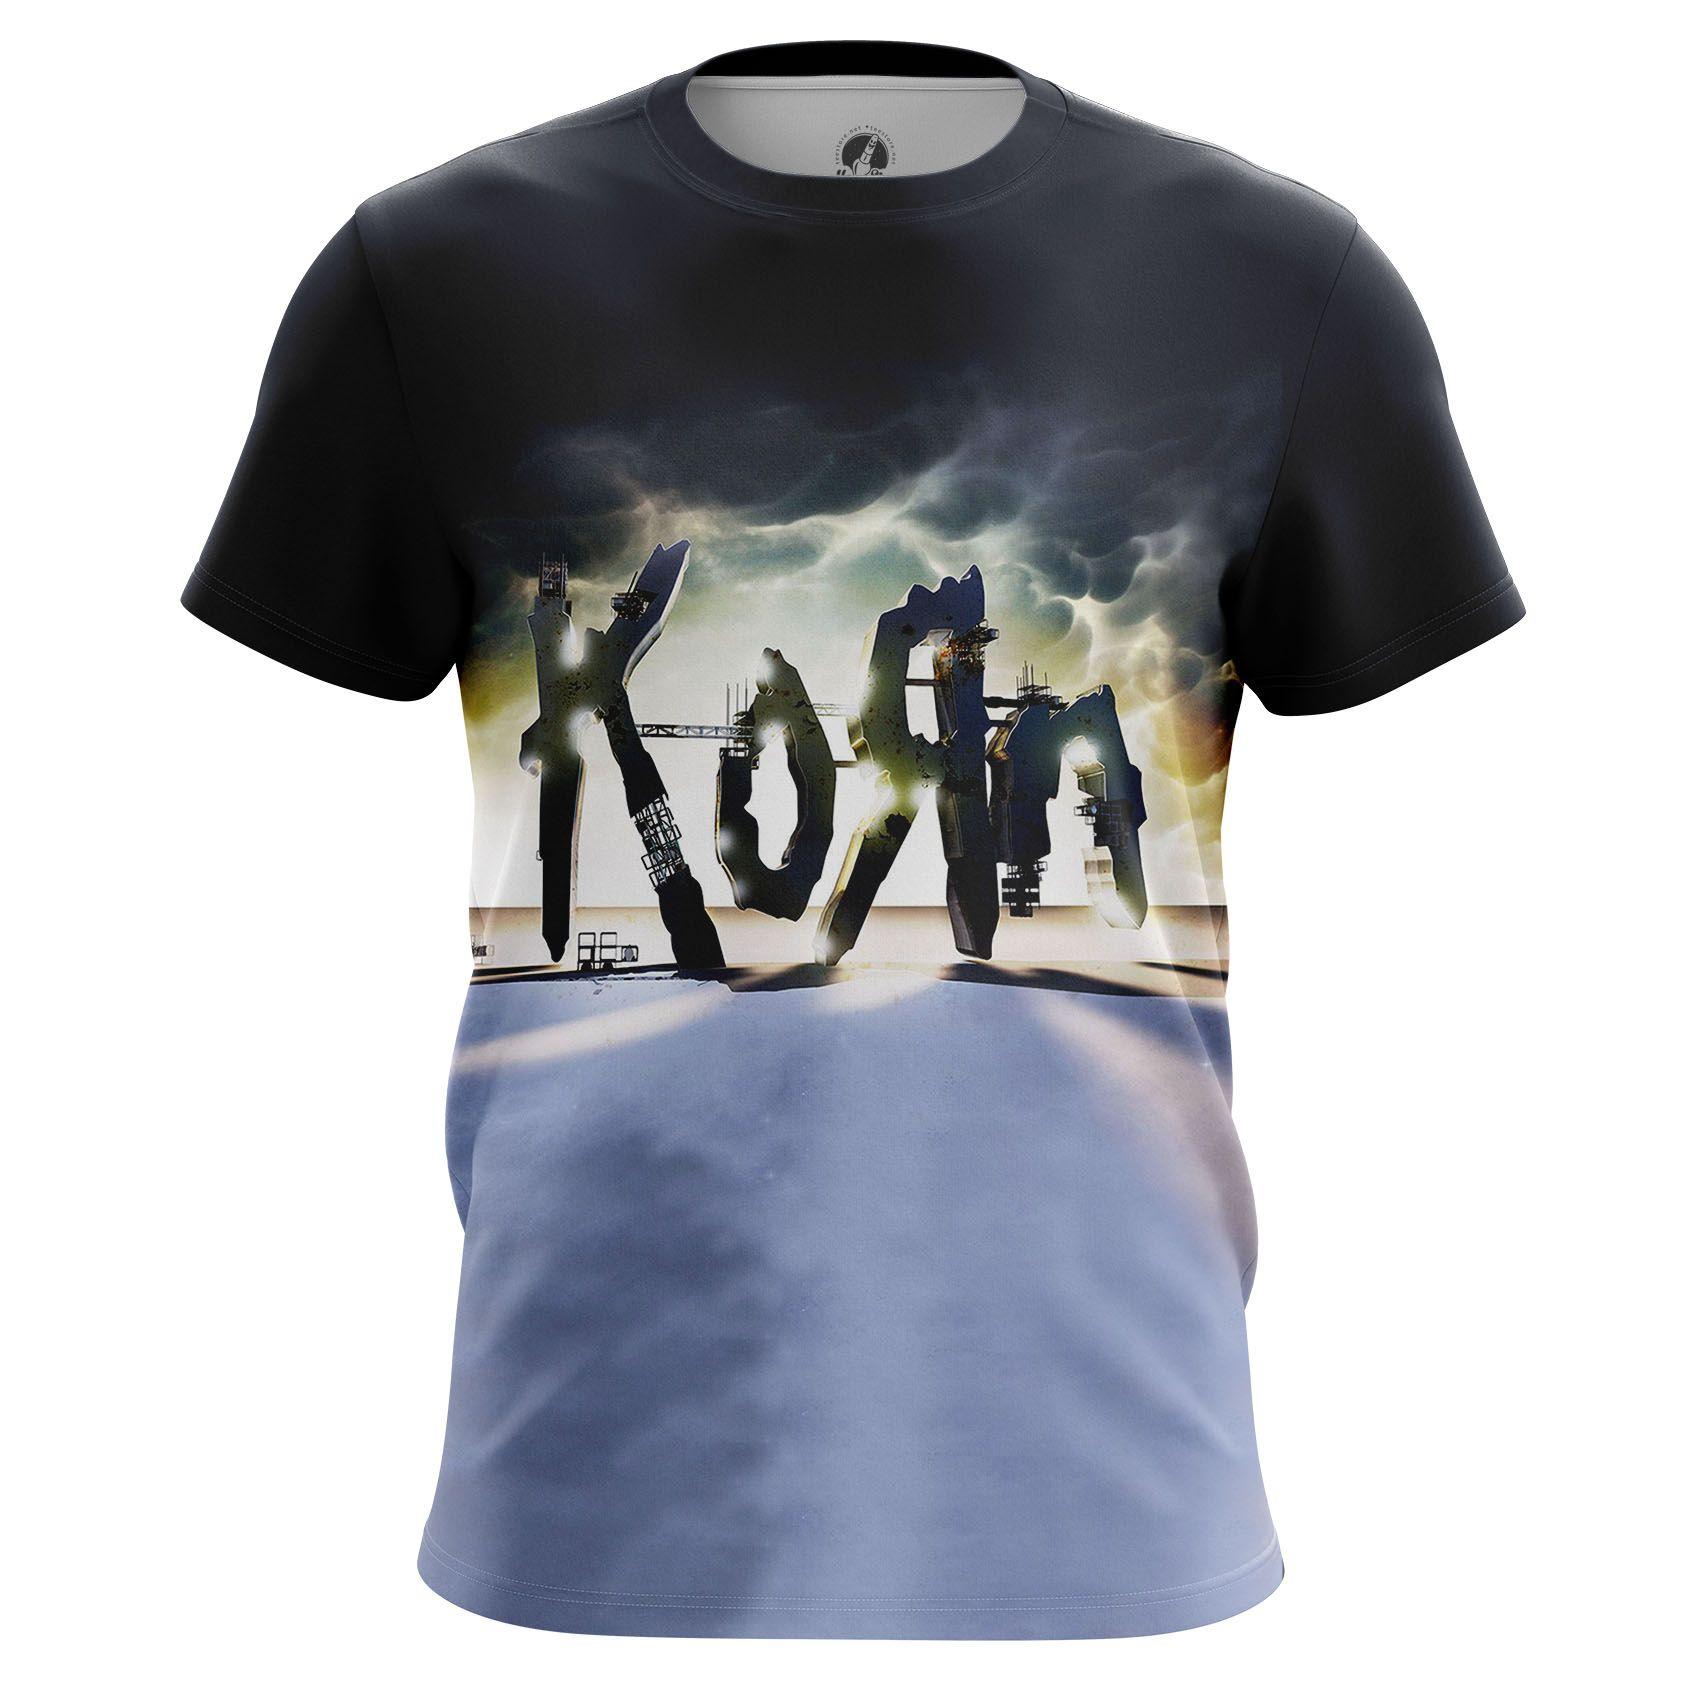 22cc3ff8dc38bf ... Loot -  amazon  Apparels  australia  boy  buy  ebay  Female  girls   india  kids  loot  Male  merch  merchandise  purchase  shirts  t-shirts   ukMerch